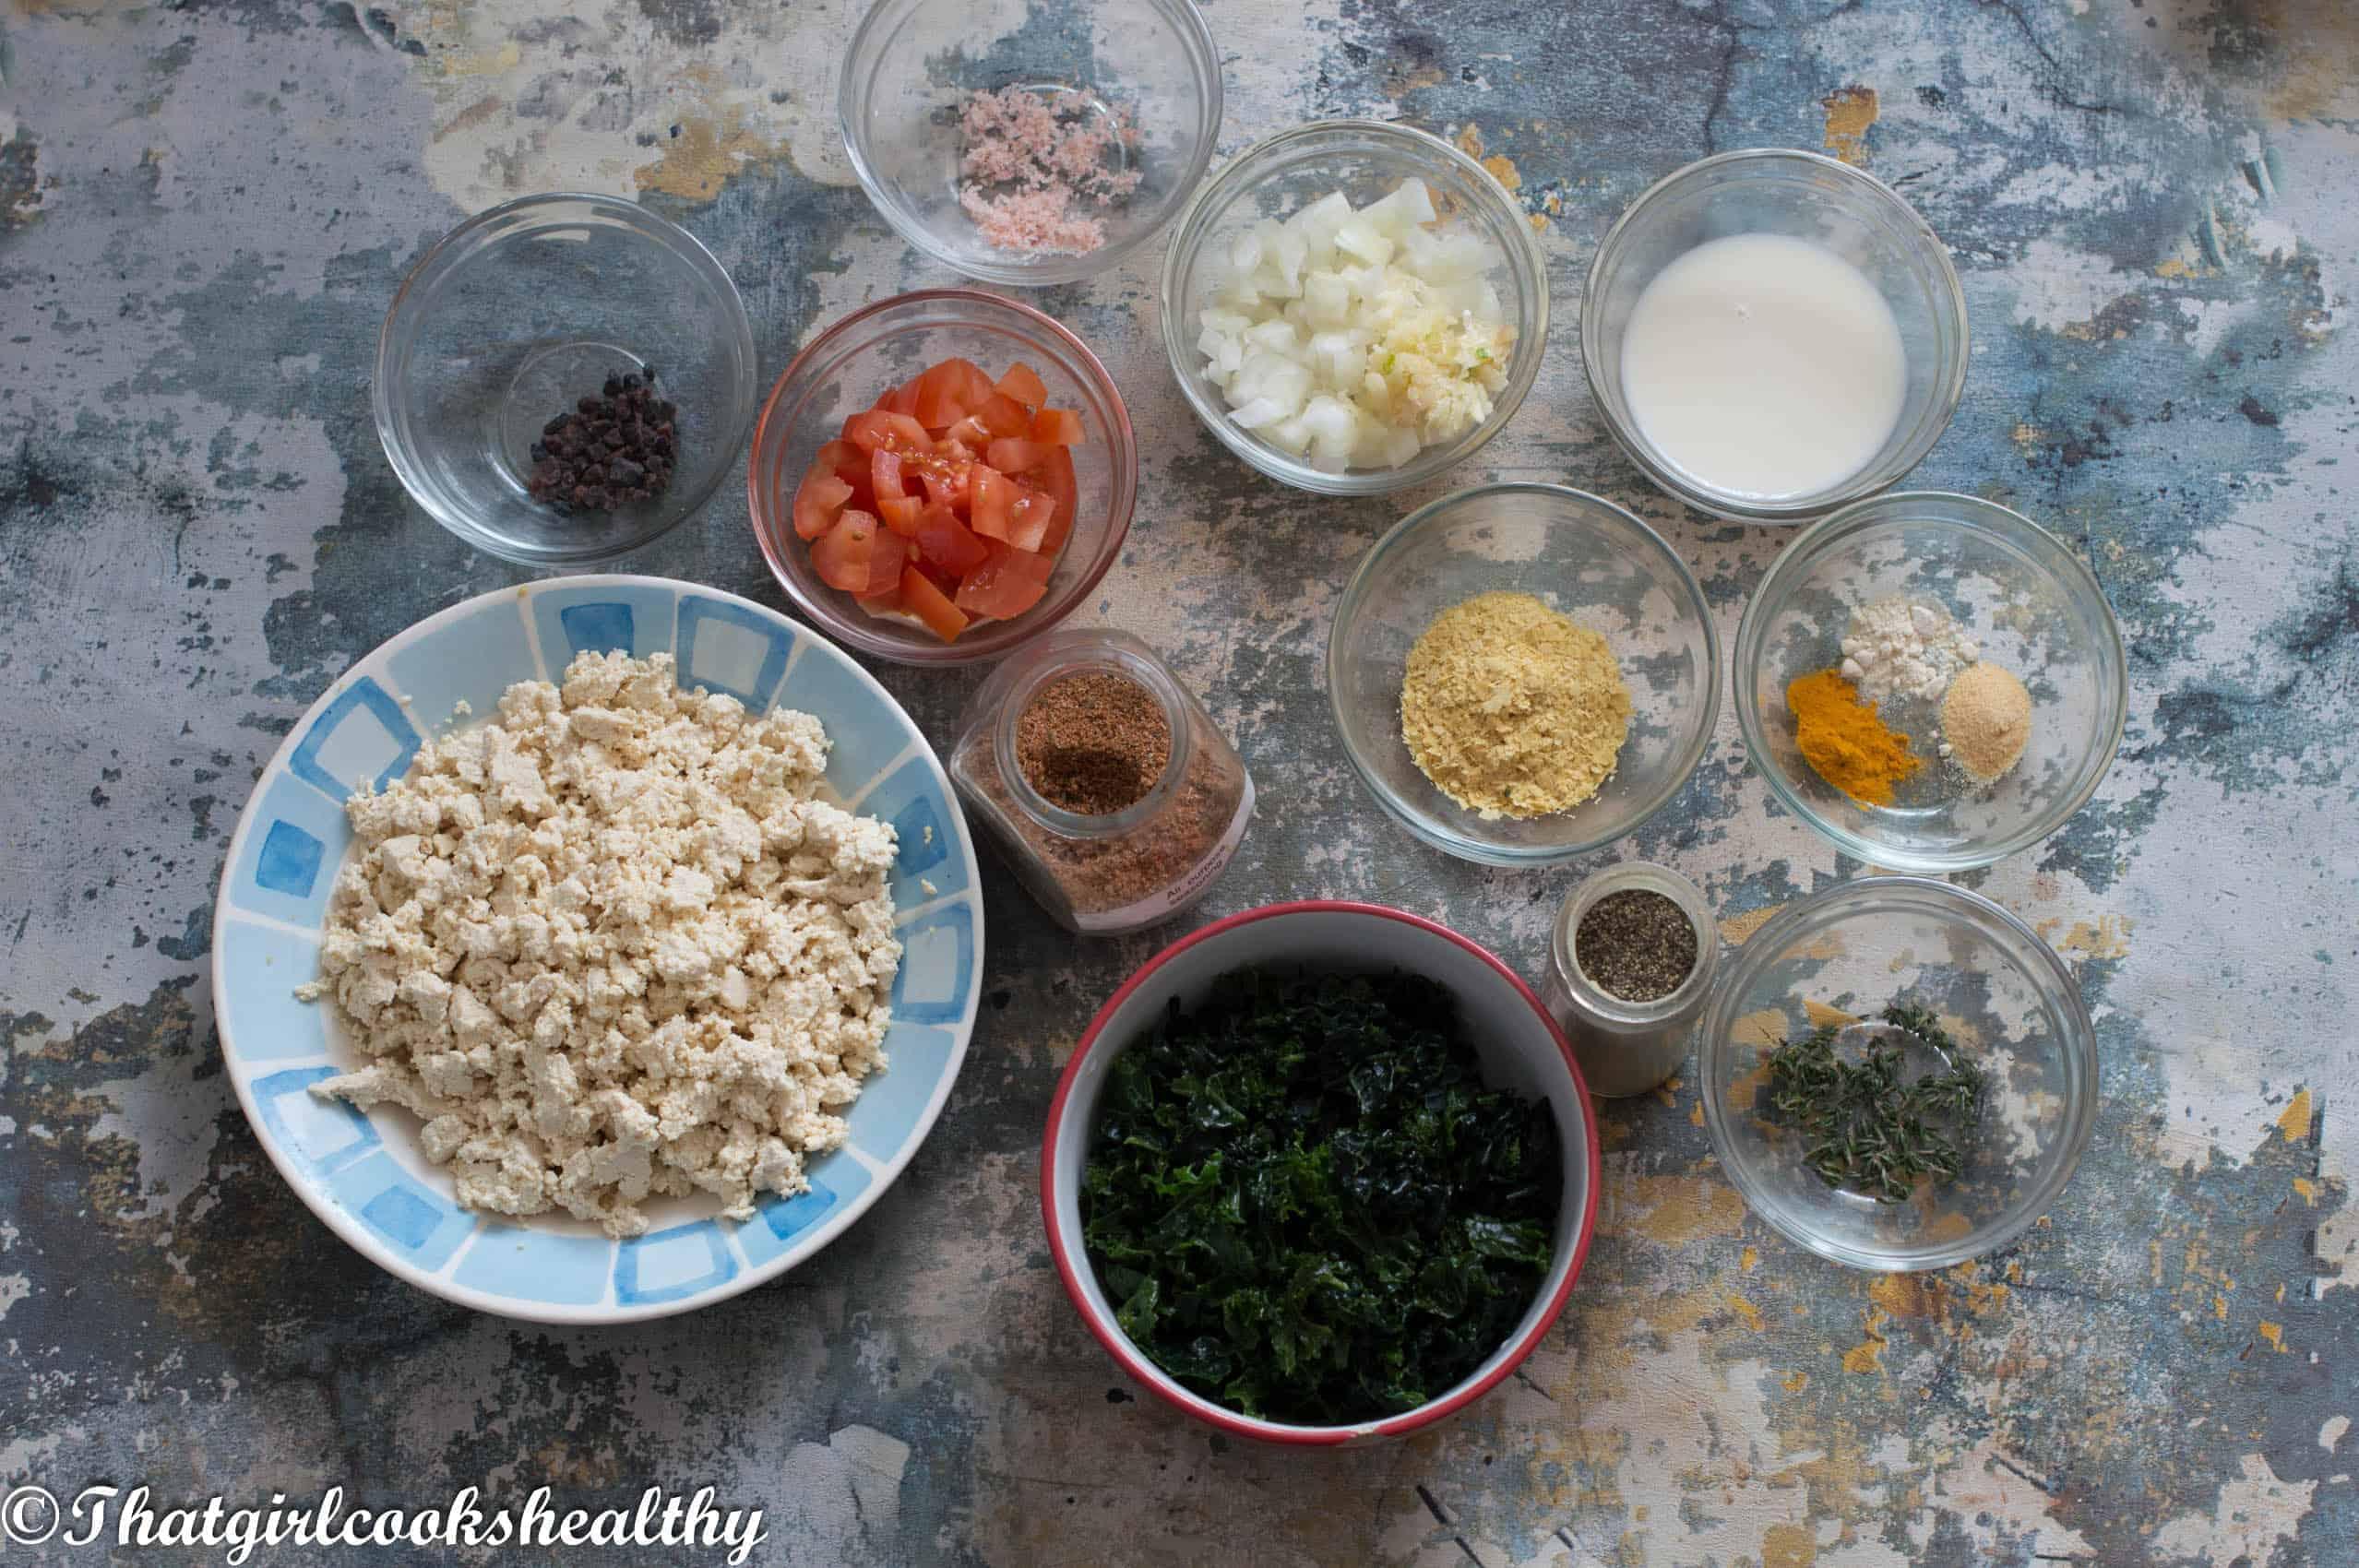 Ingredients you need